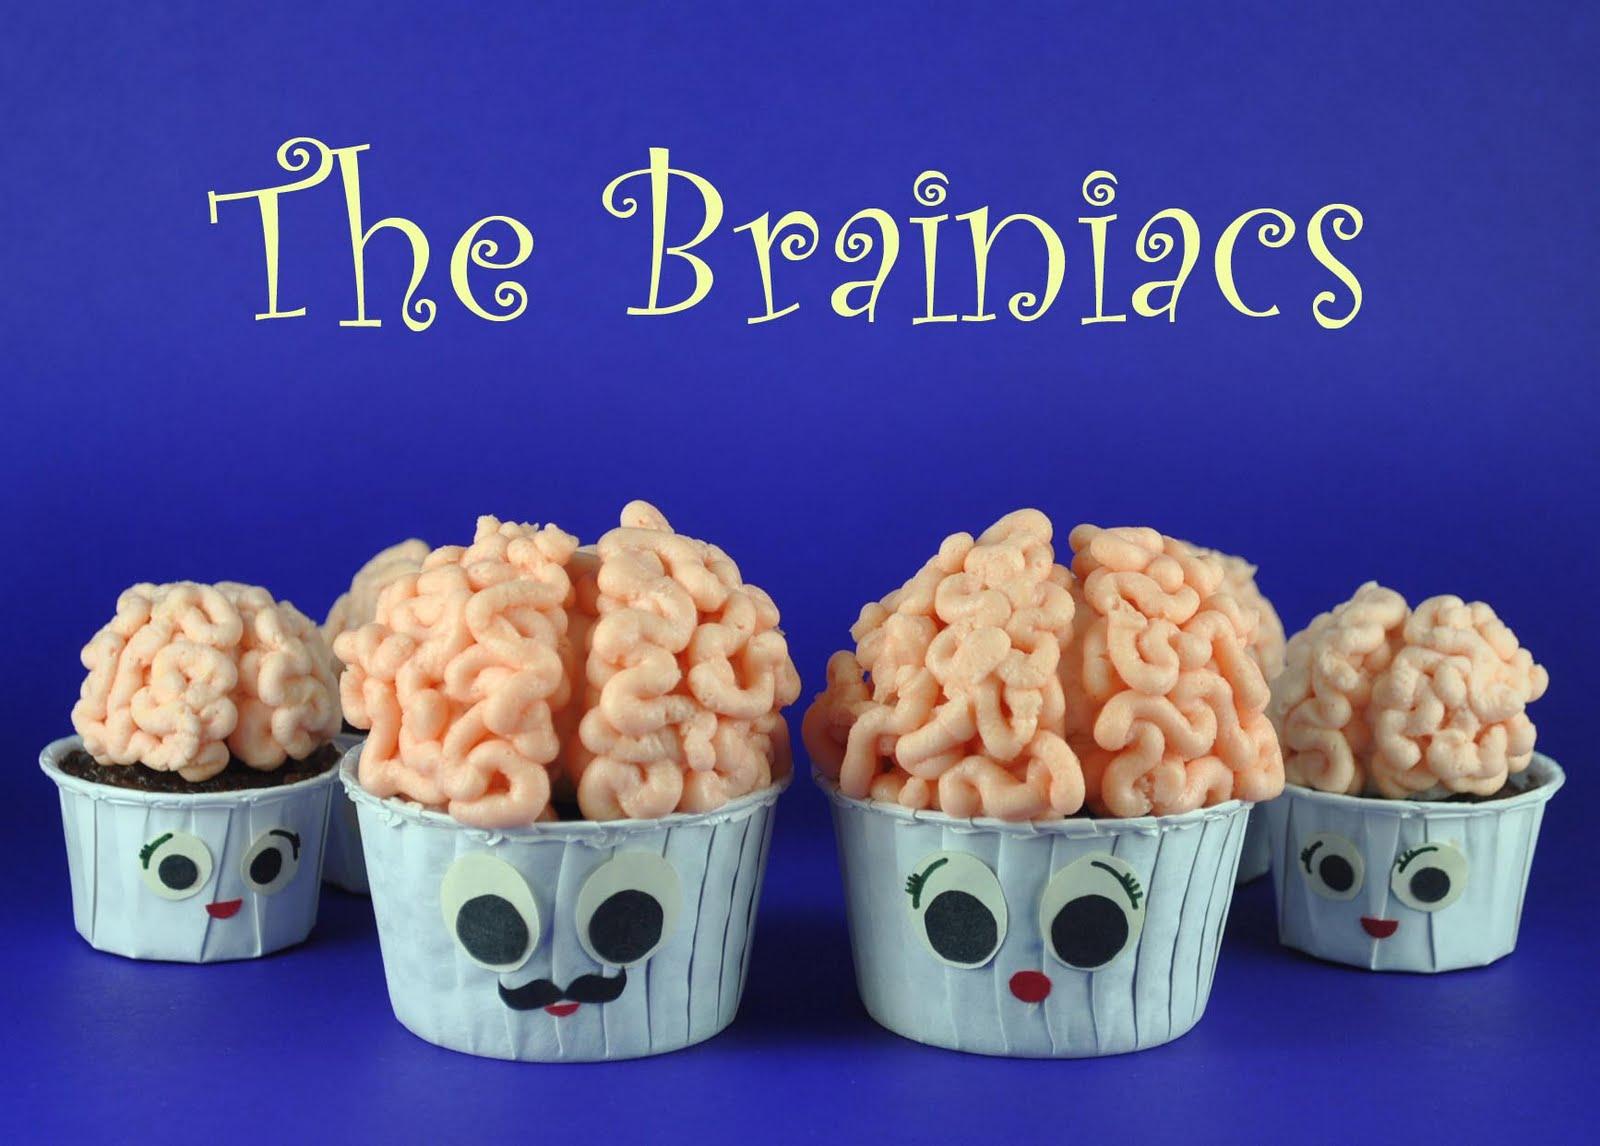 How to Make Brain Cupcakes (or Brainiac Cupcakes) - Bake Happy